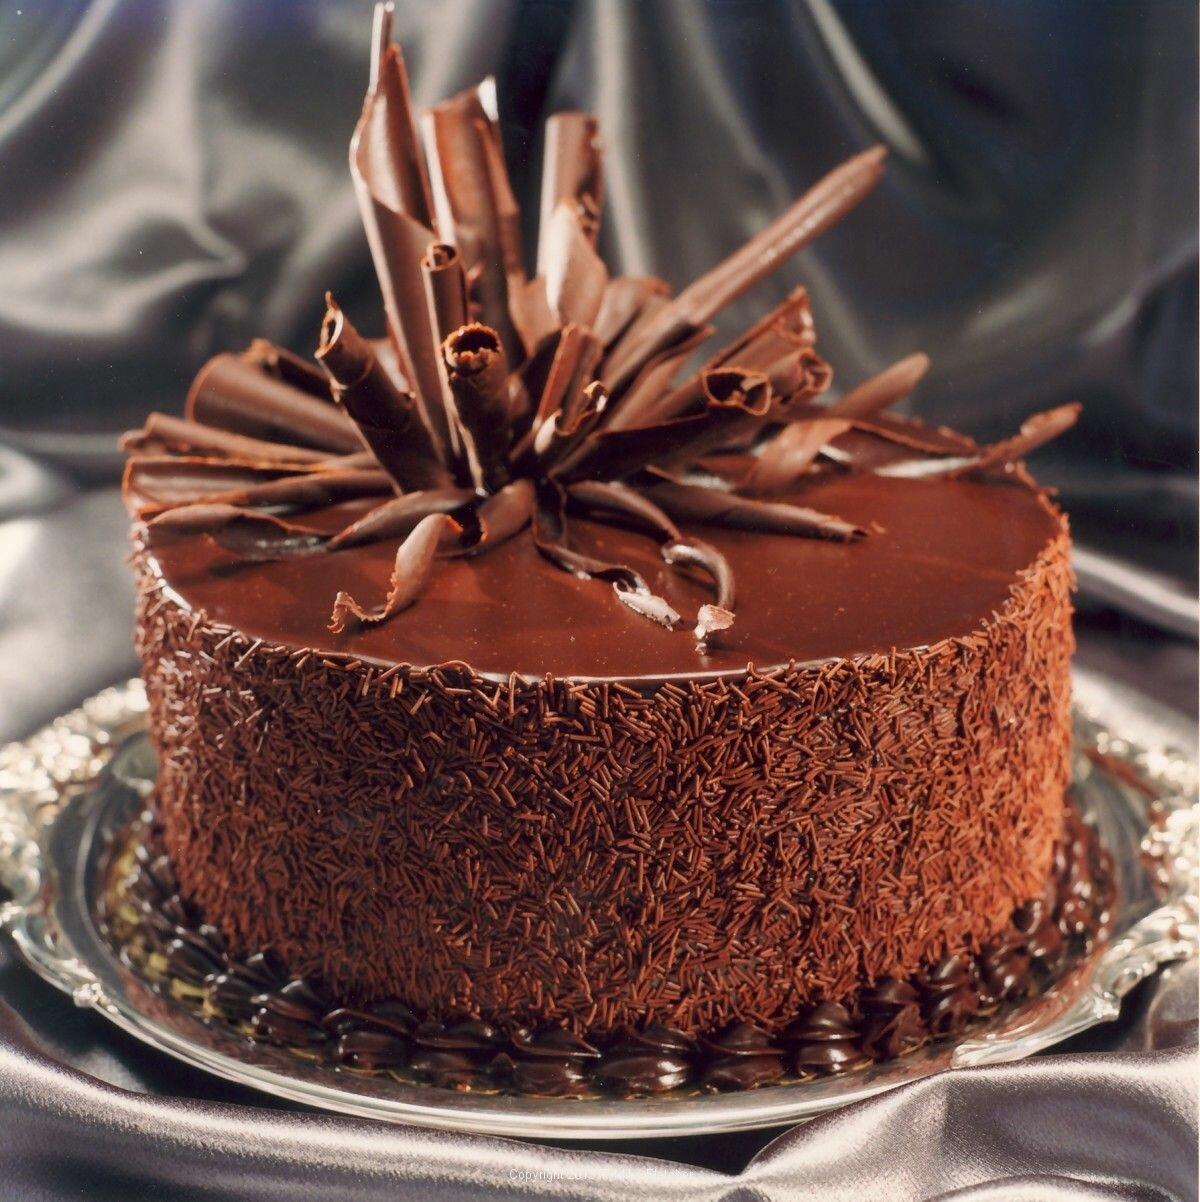 фото украшений для торта в домашних условиях